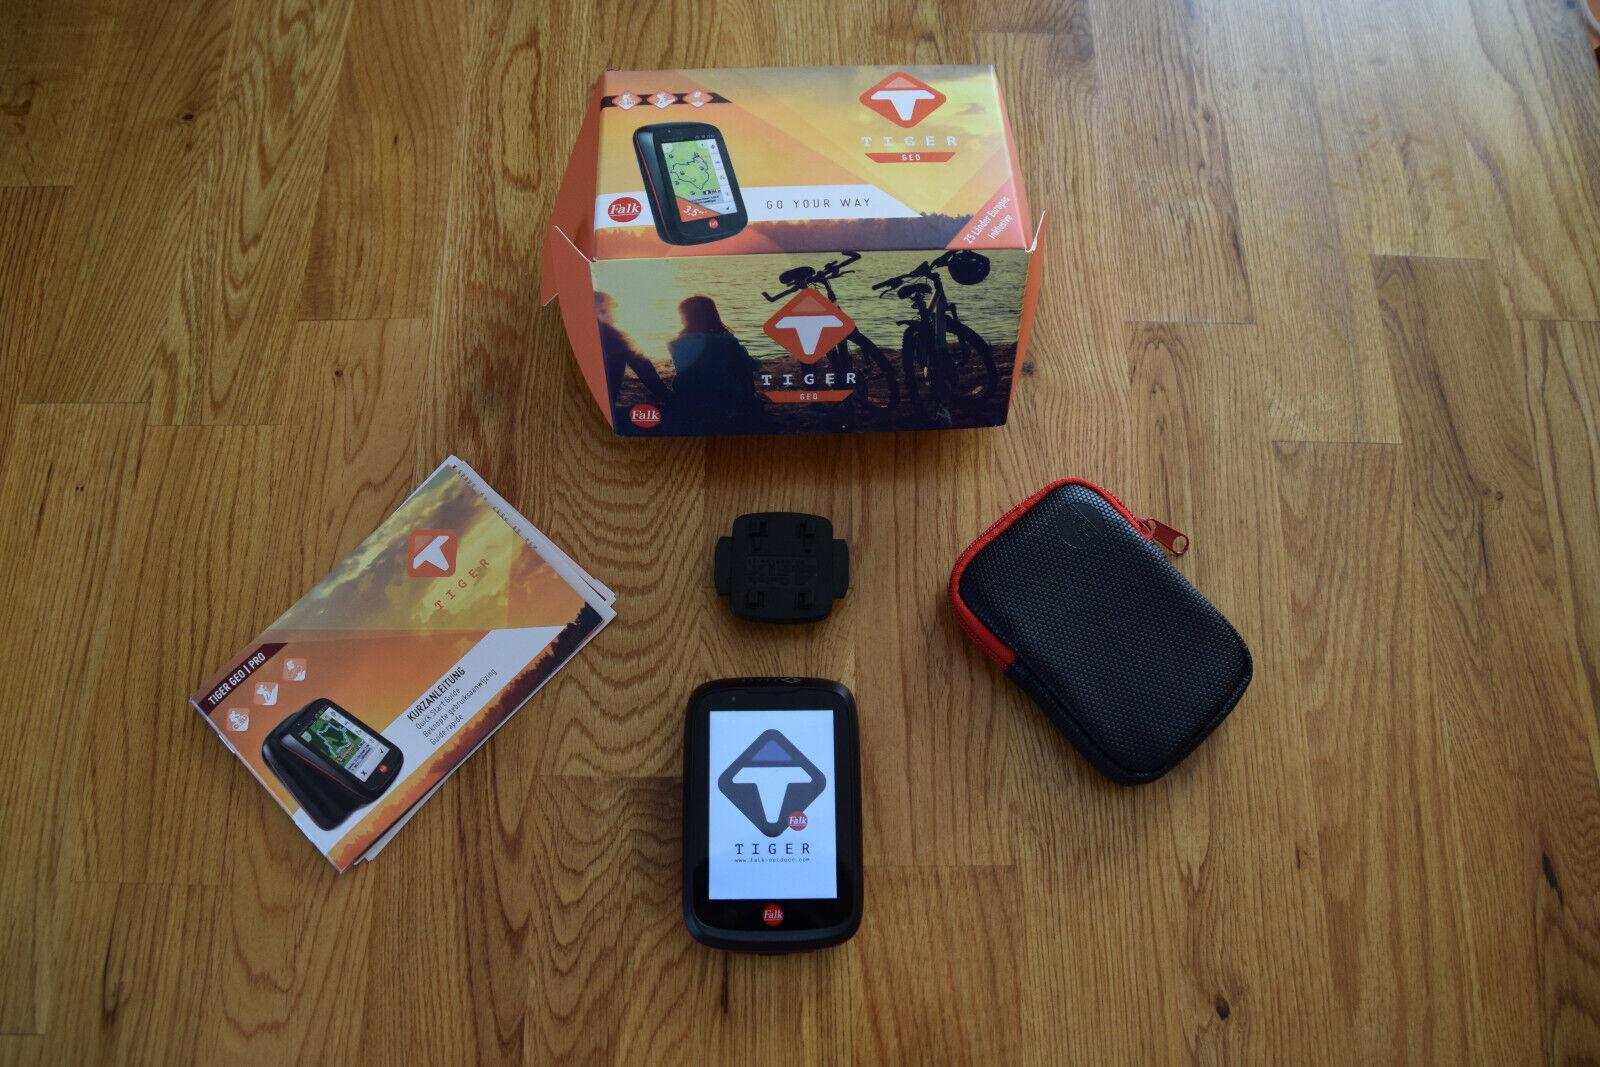 Falk Tiger Geo Outdoornavigationsgerät mit GPS